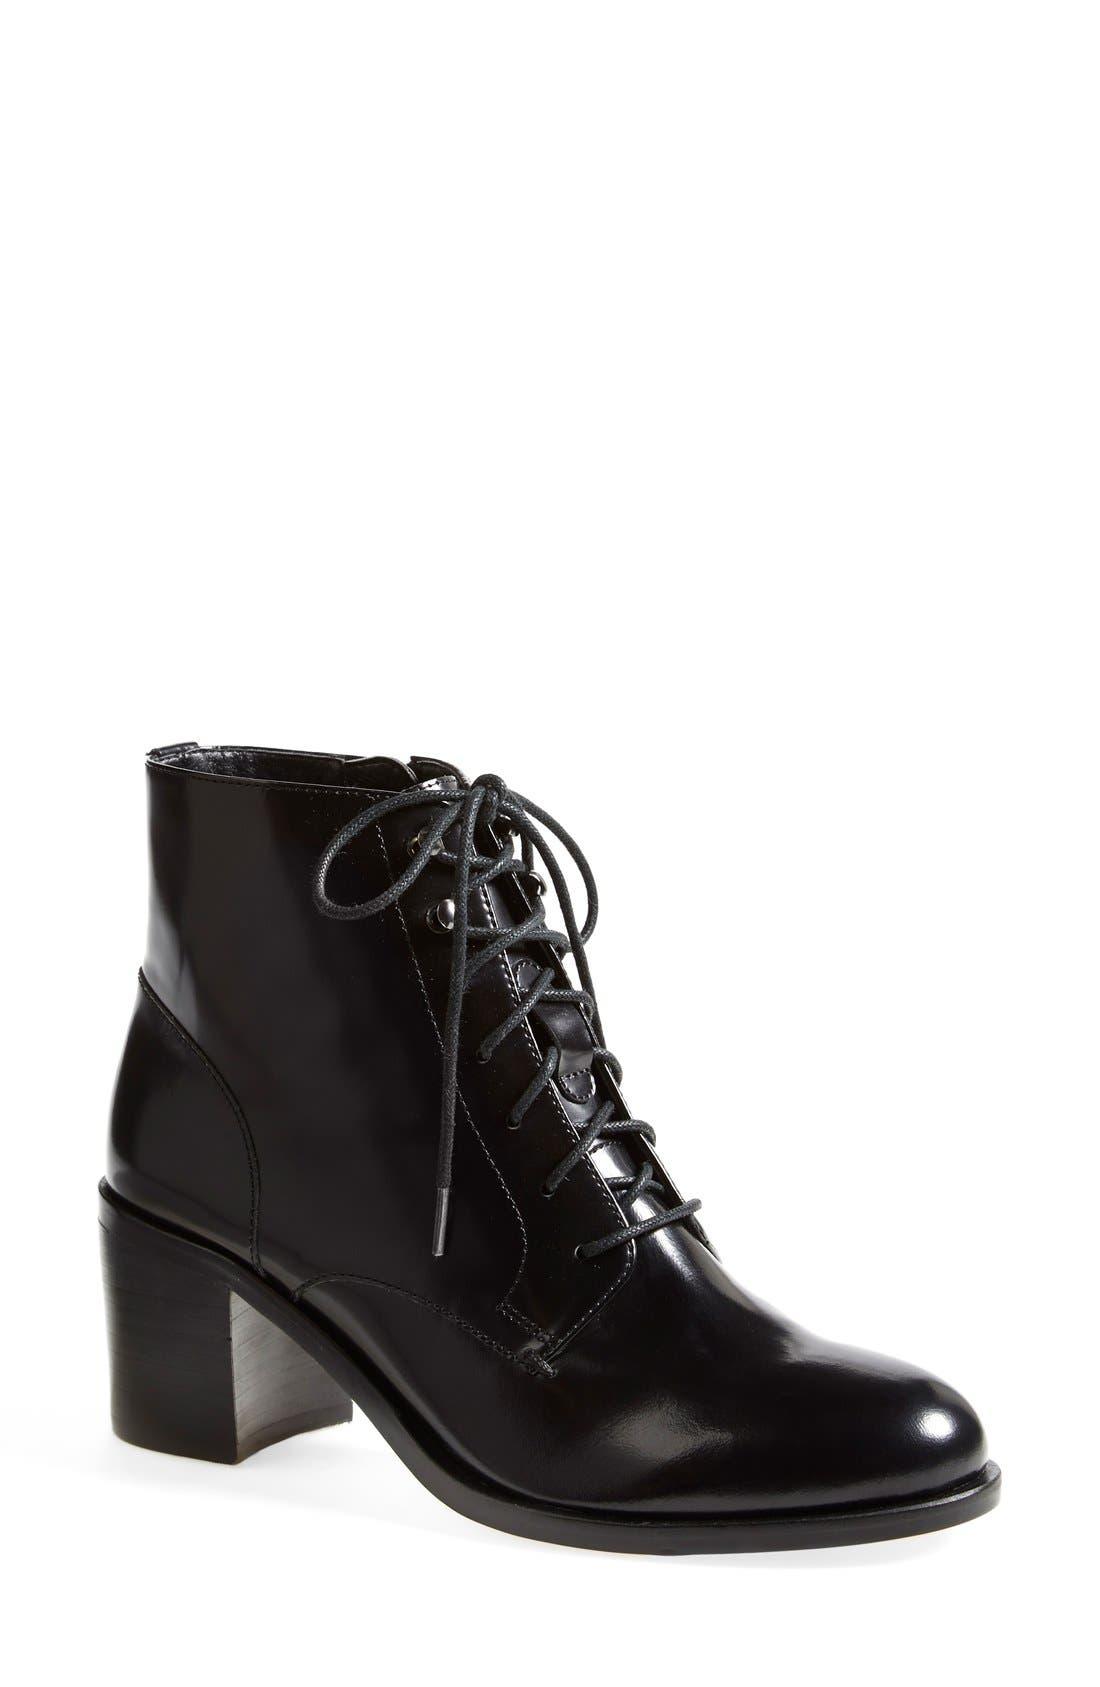 Main Image - Sam Edelman 'Jardin' Leather Bootie (Women)